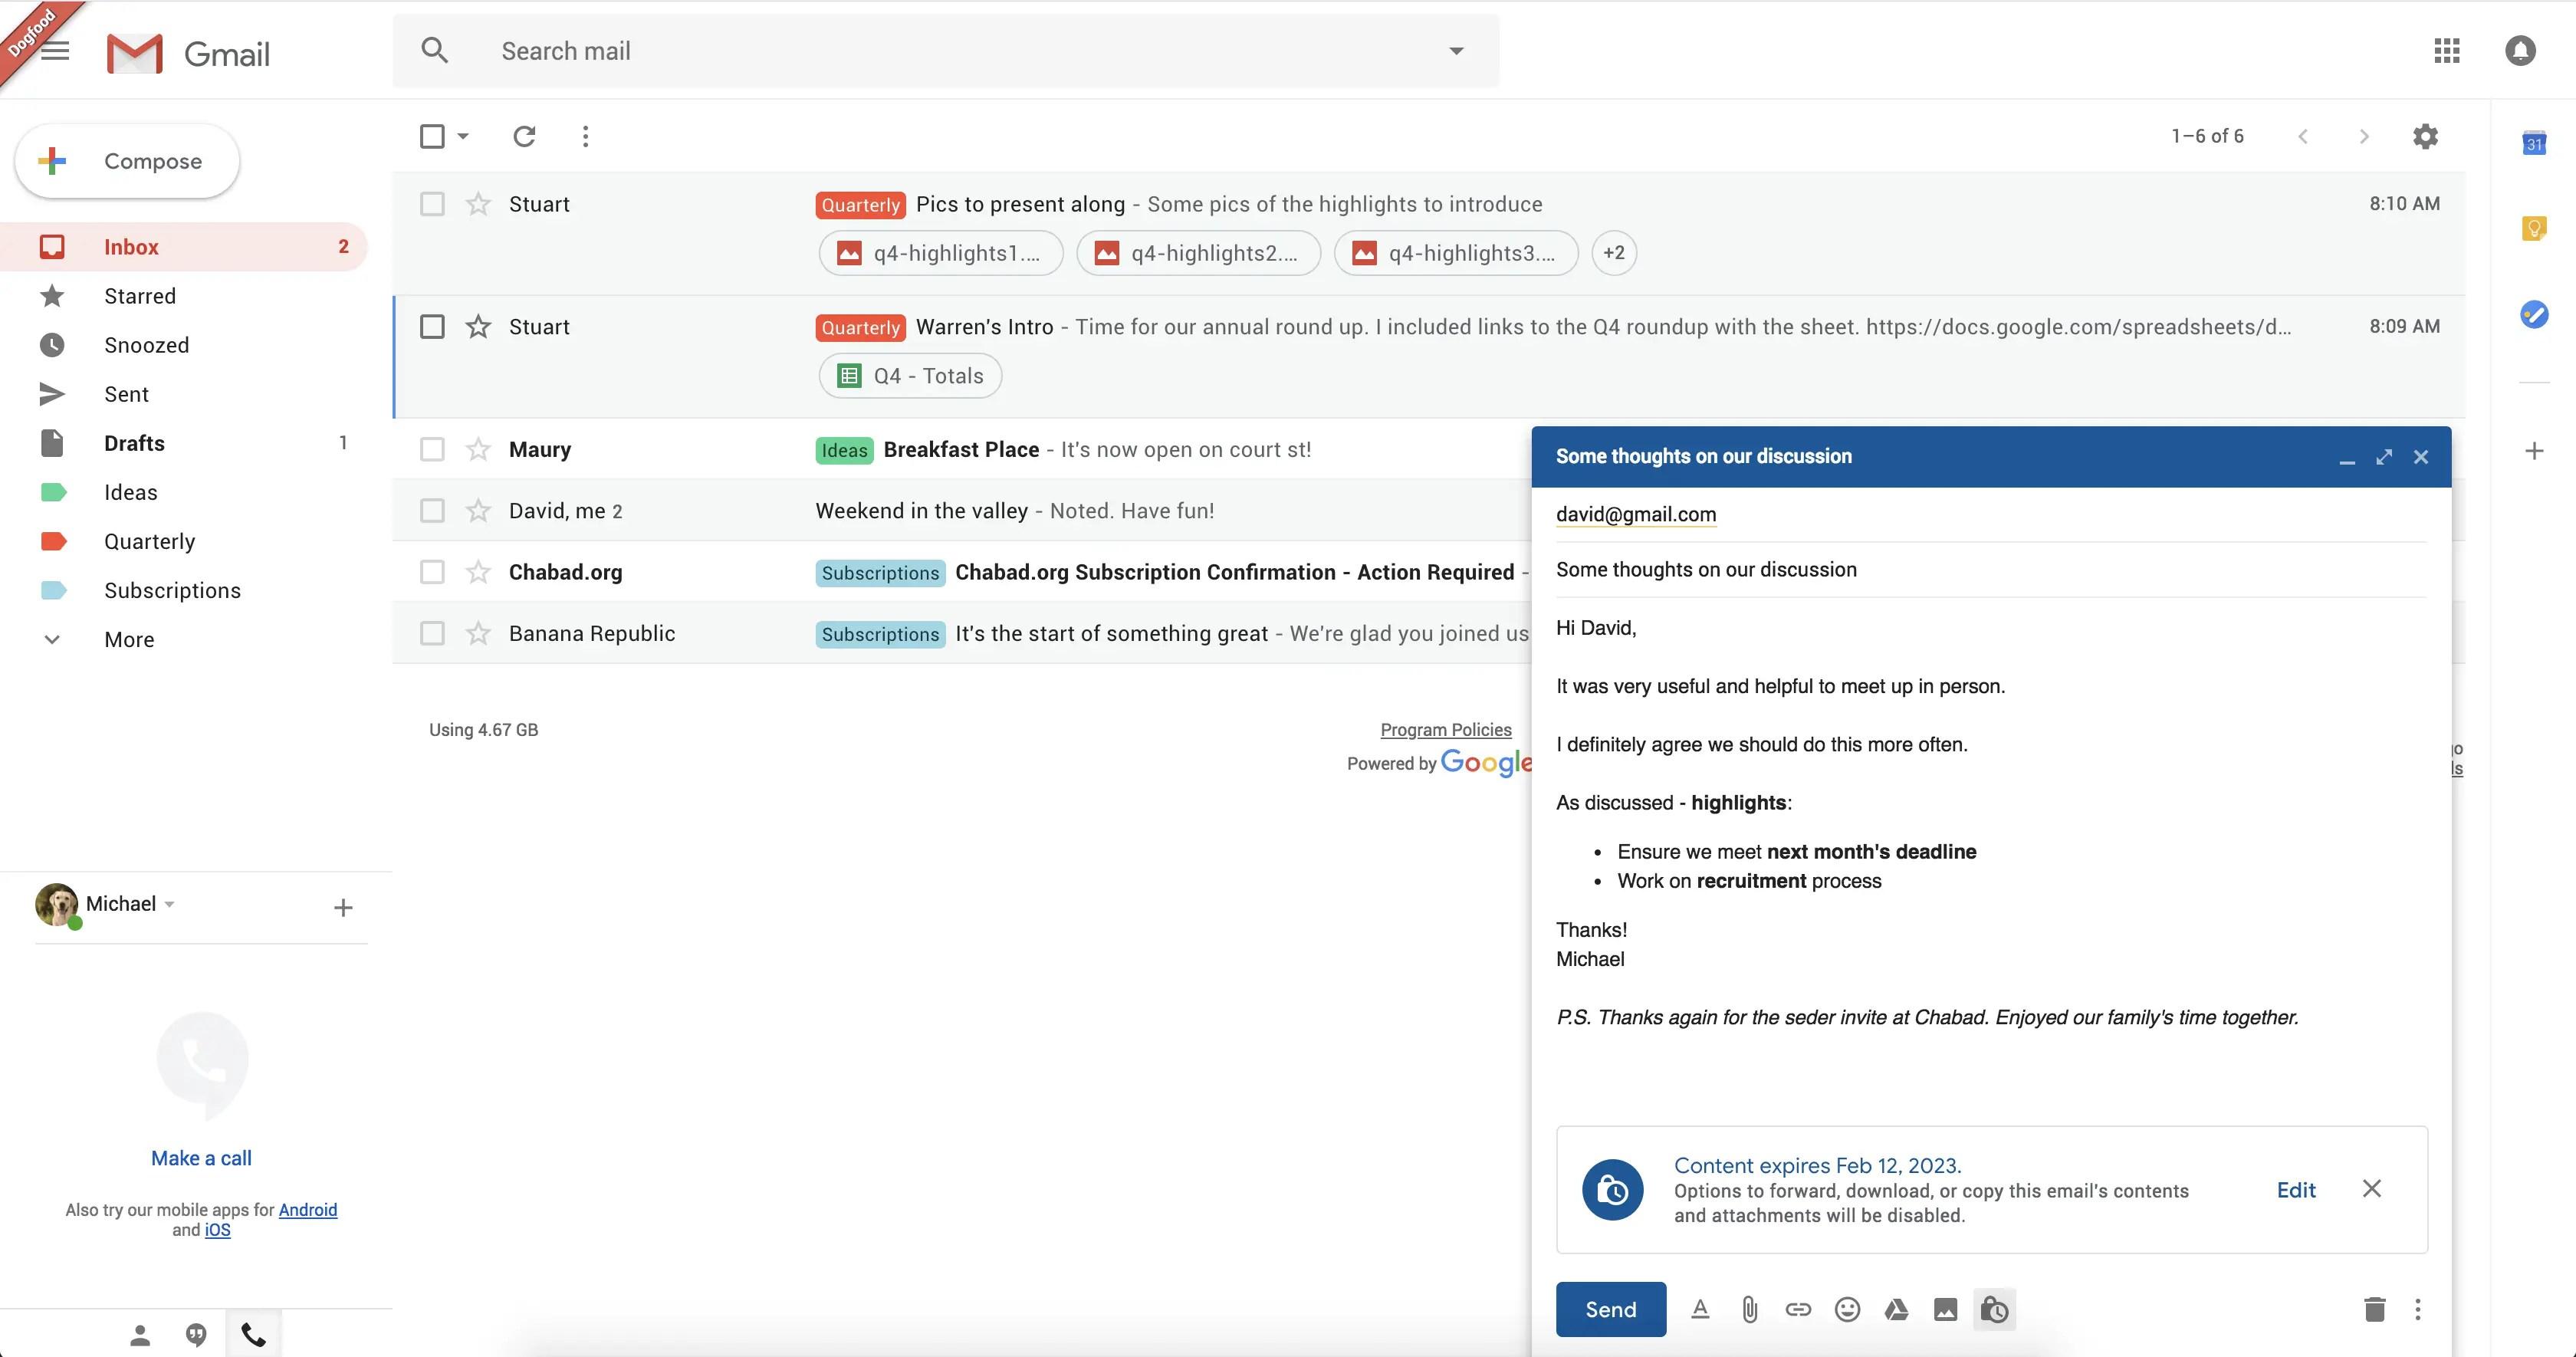 wersm-gmail-confidential-expiry-self-destruct-send-1